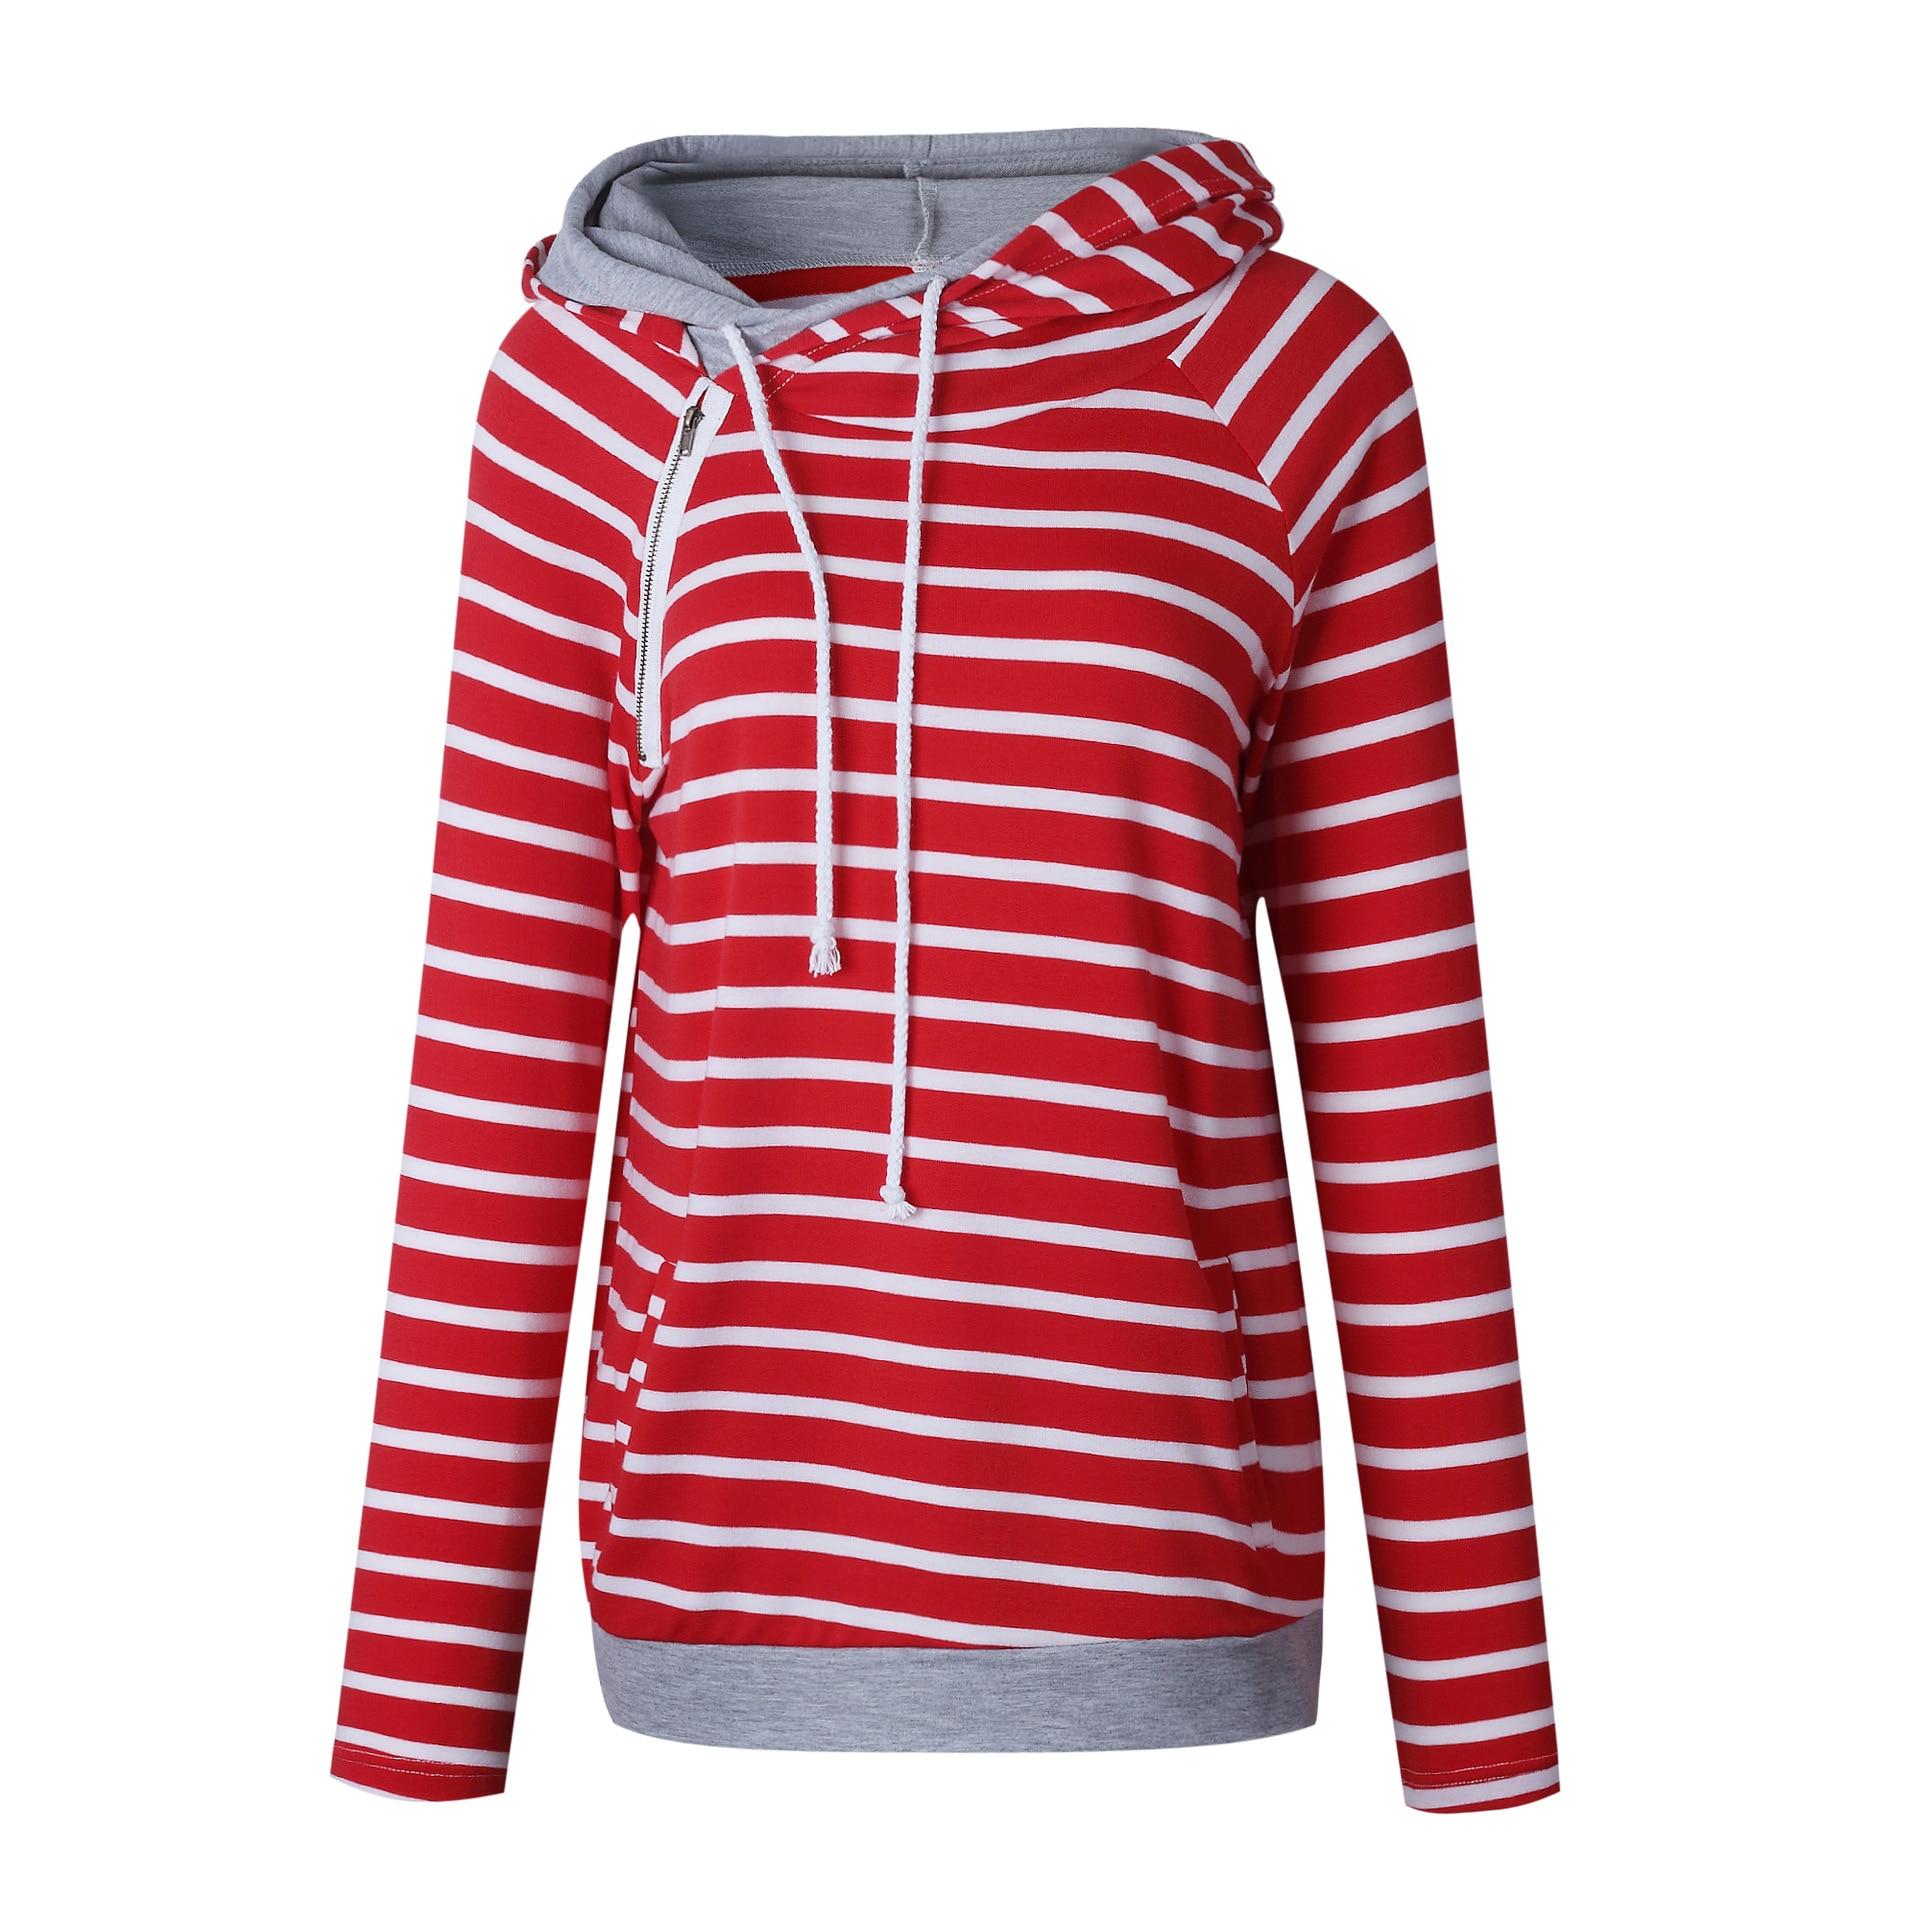 Straße kleid Herbst Mädchen Pullover Hoodeds Hut Streetwears Striped Frauen Mode Sexy Trainingsanzug Hoodies Kpop Trendsetter MOOWNUC